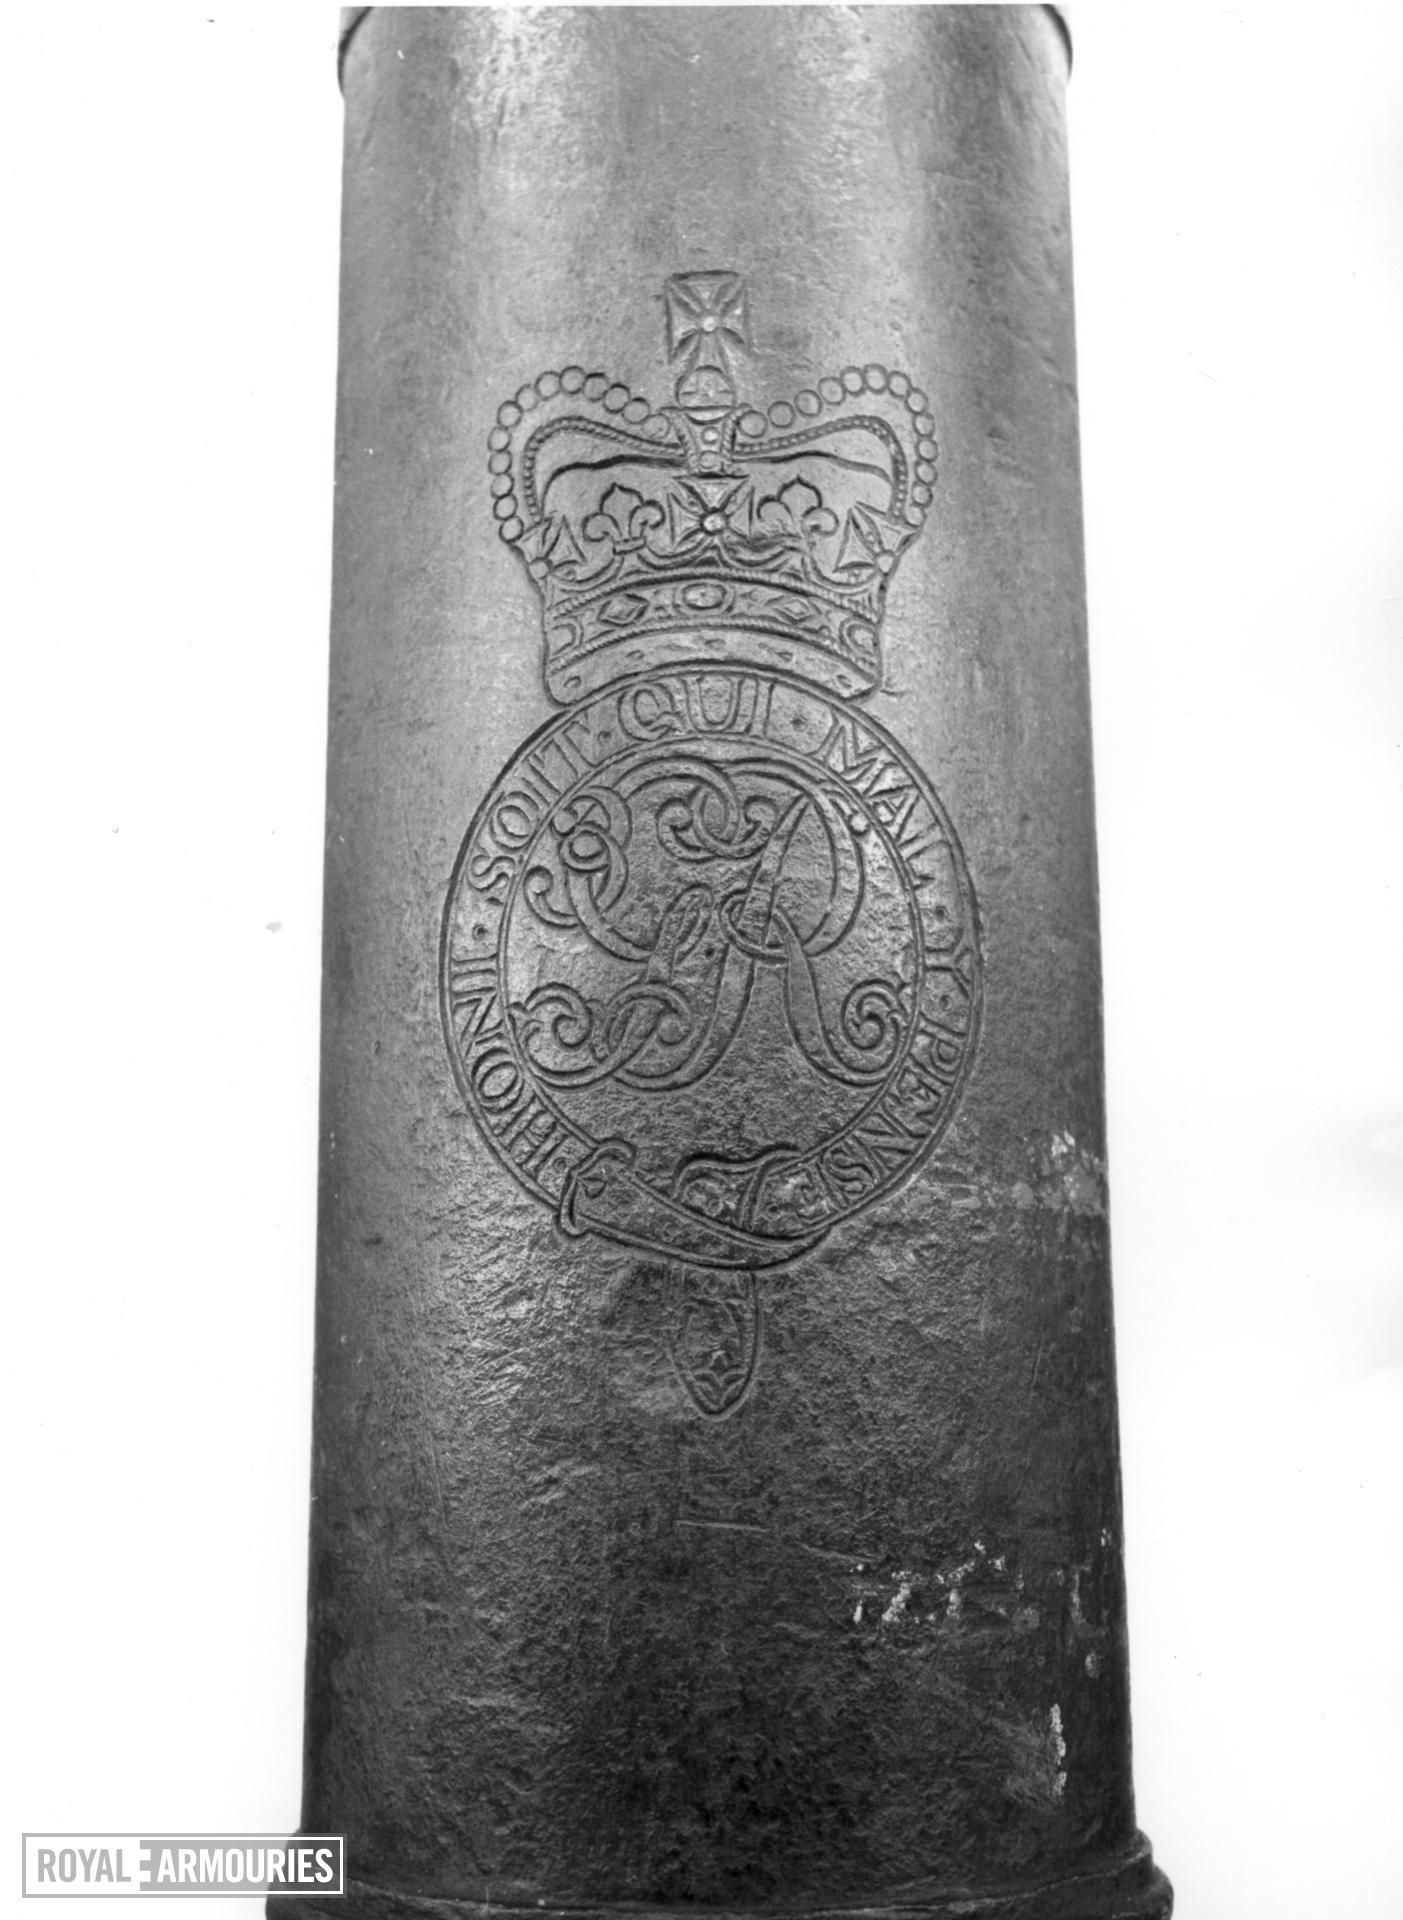 1 pr gun Made of bronze Cast by I & H King